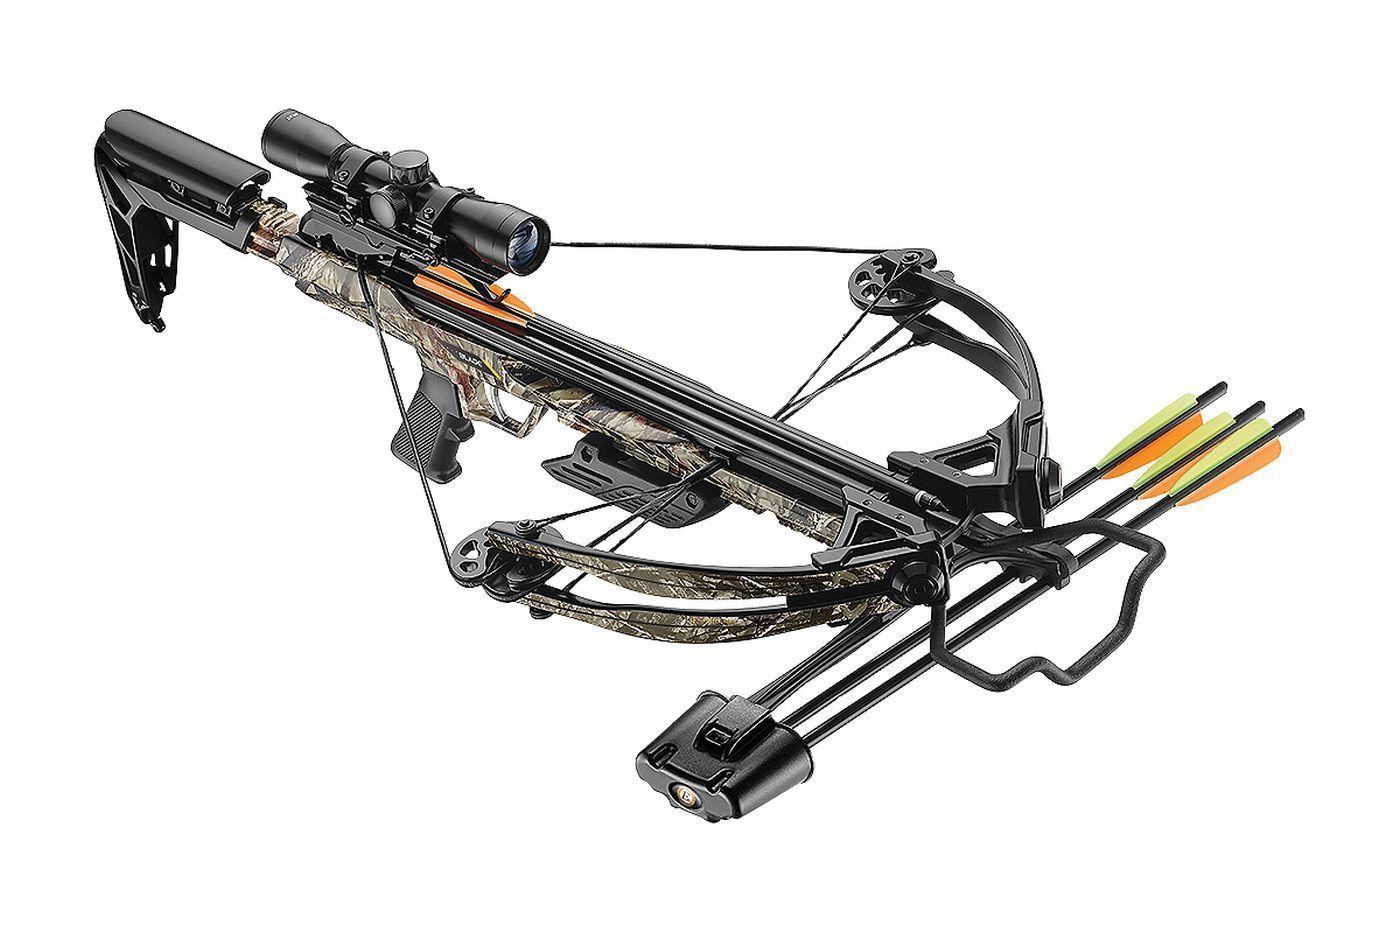 Ek Archery Blade Camo Armbrust